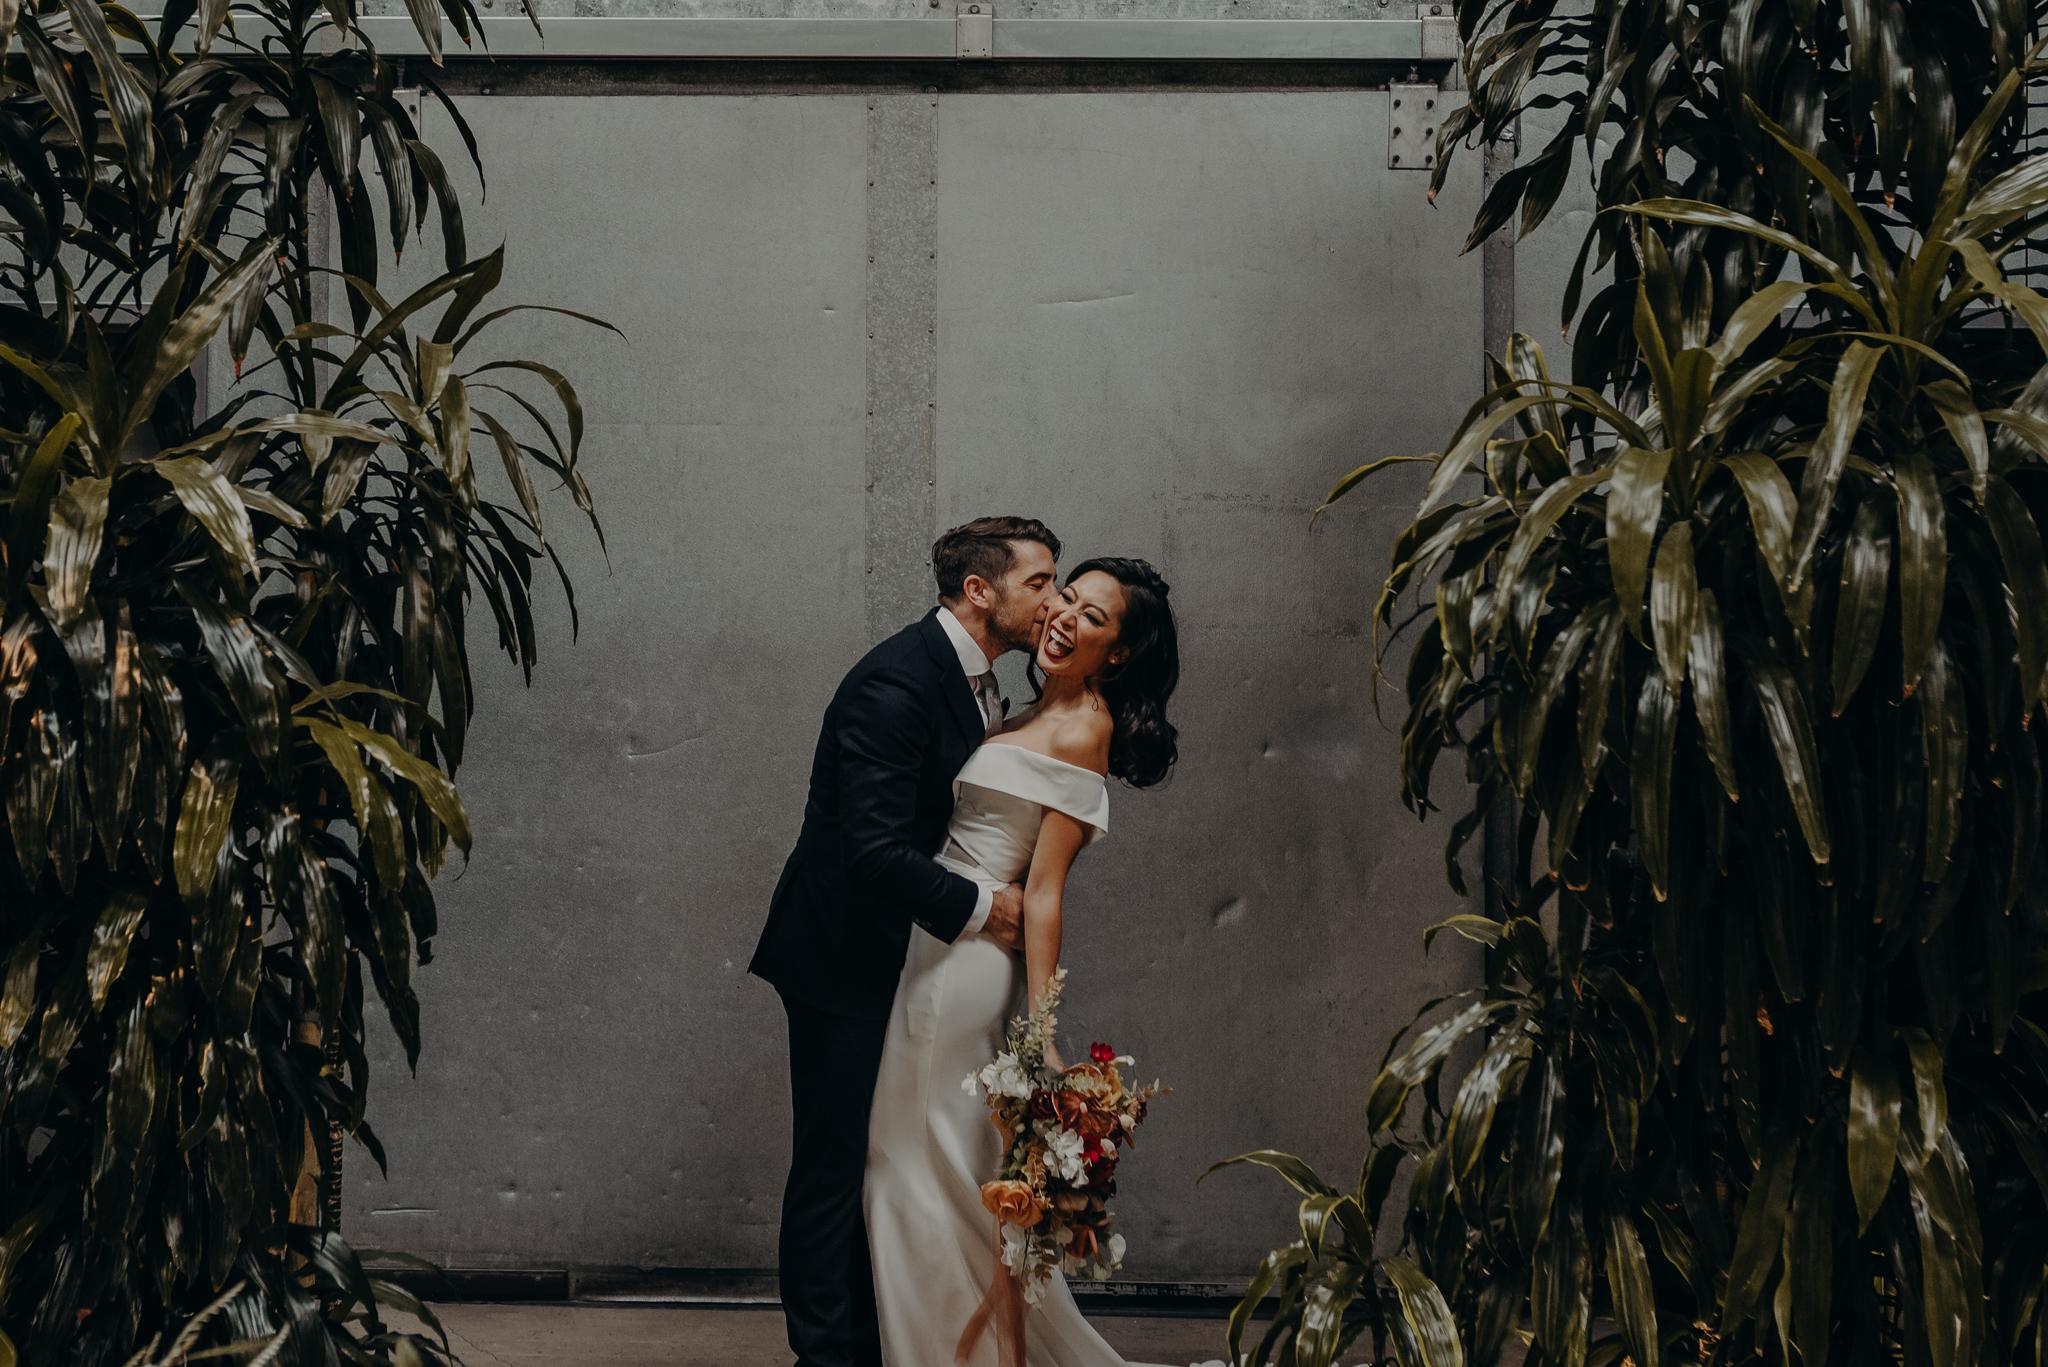 Wedding Photo LA - wedding photographer in los angeles - millwick wedding venue -isaiahandtaylor.com-034.jpg